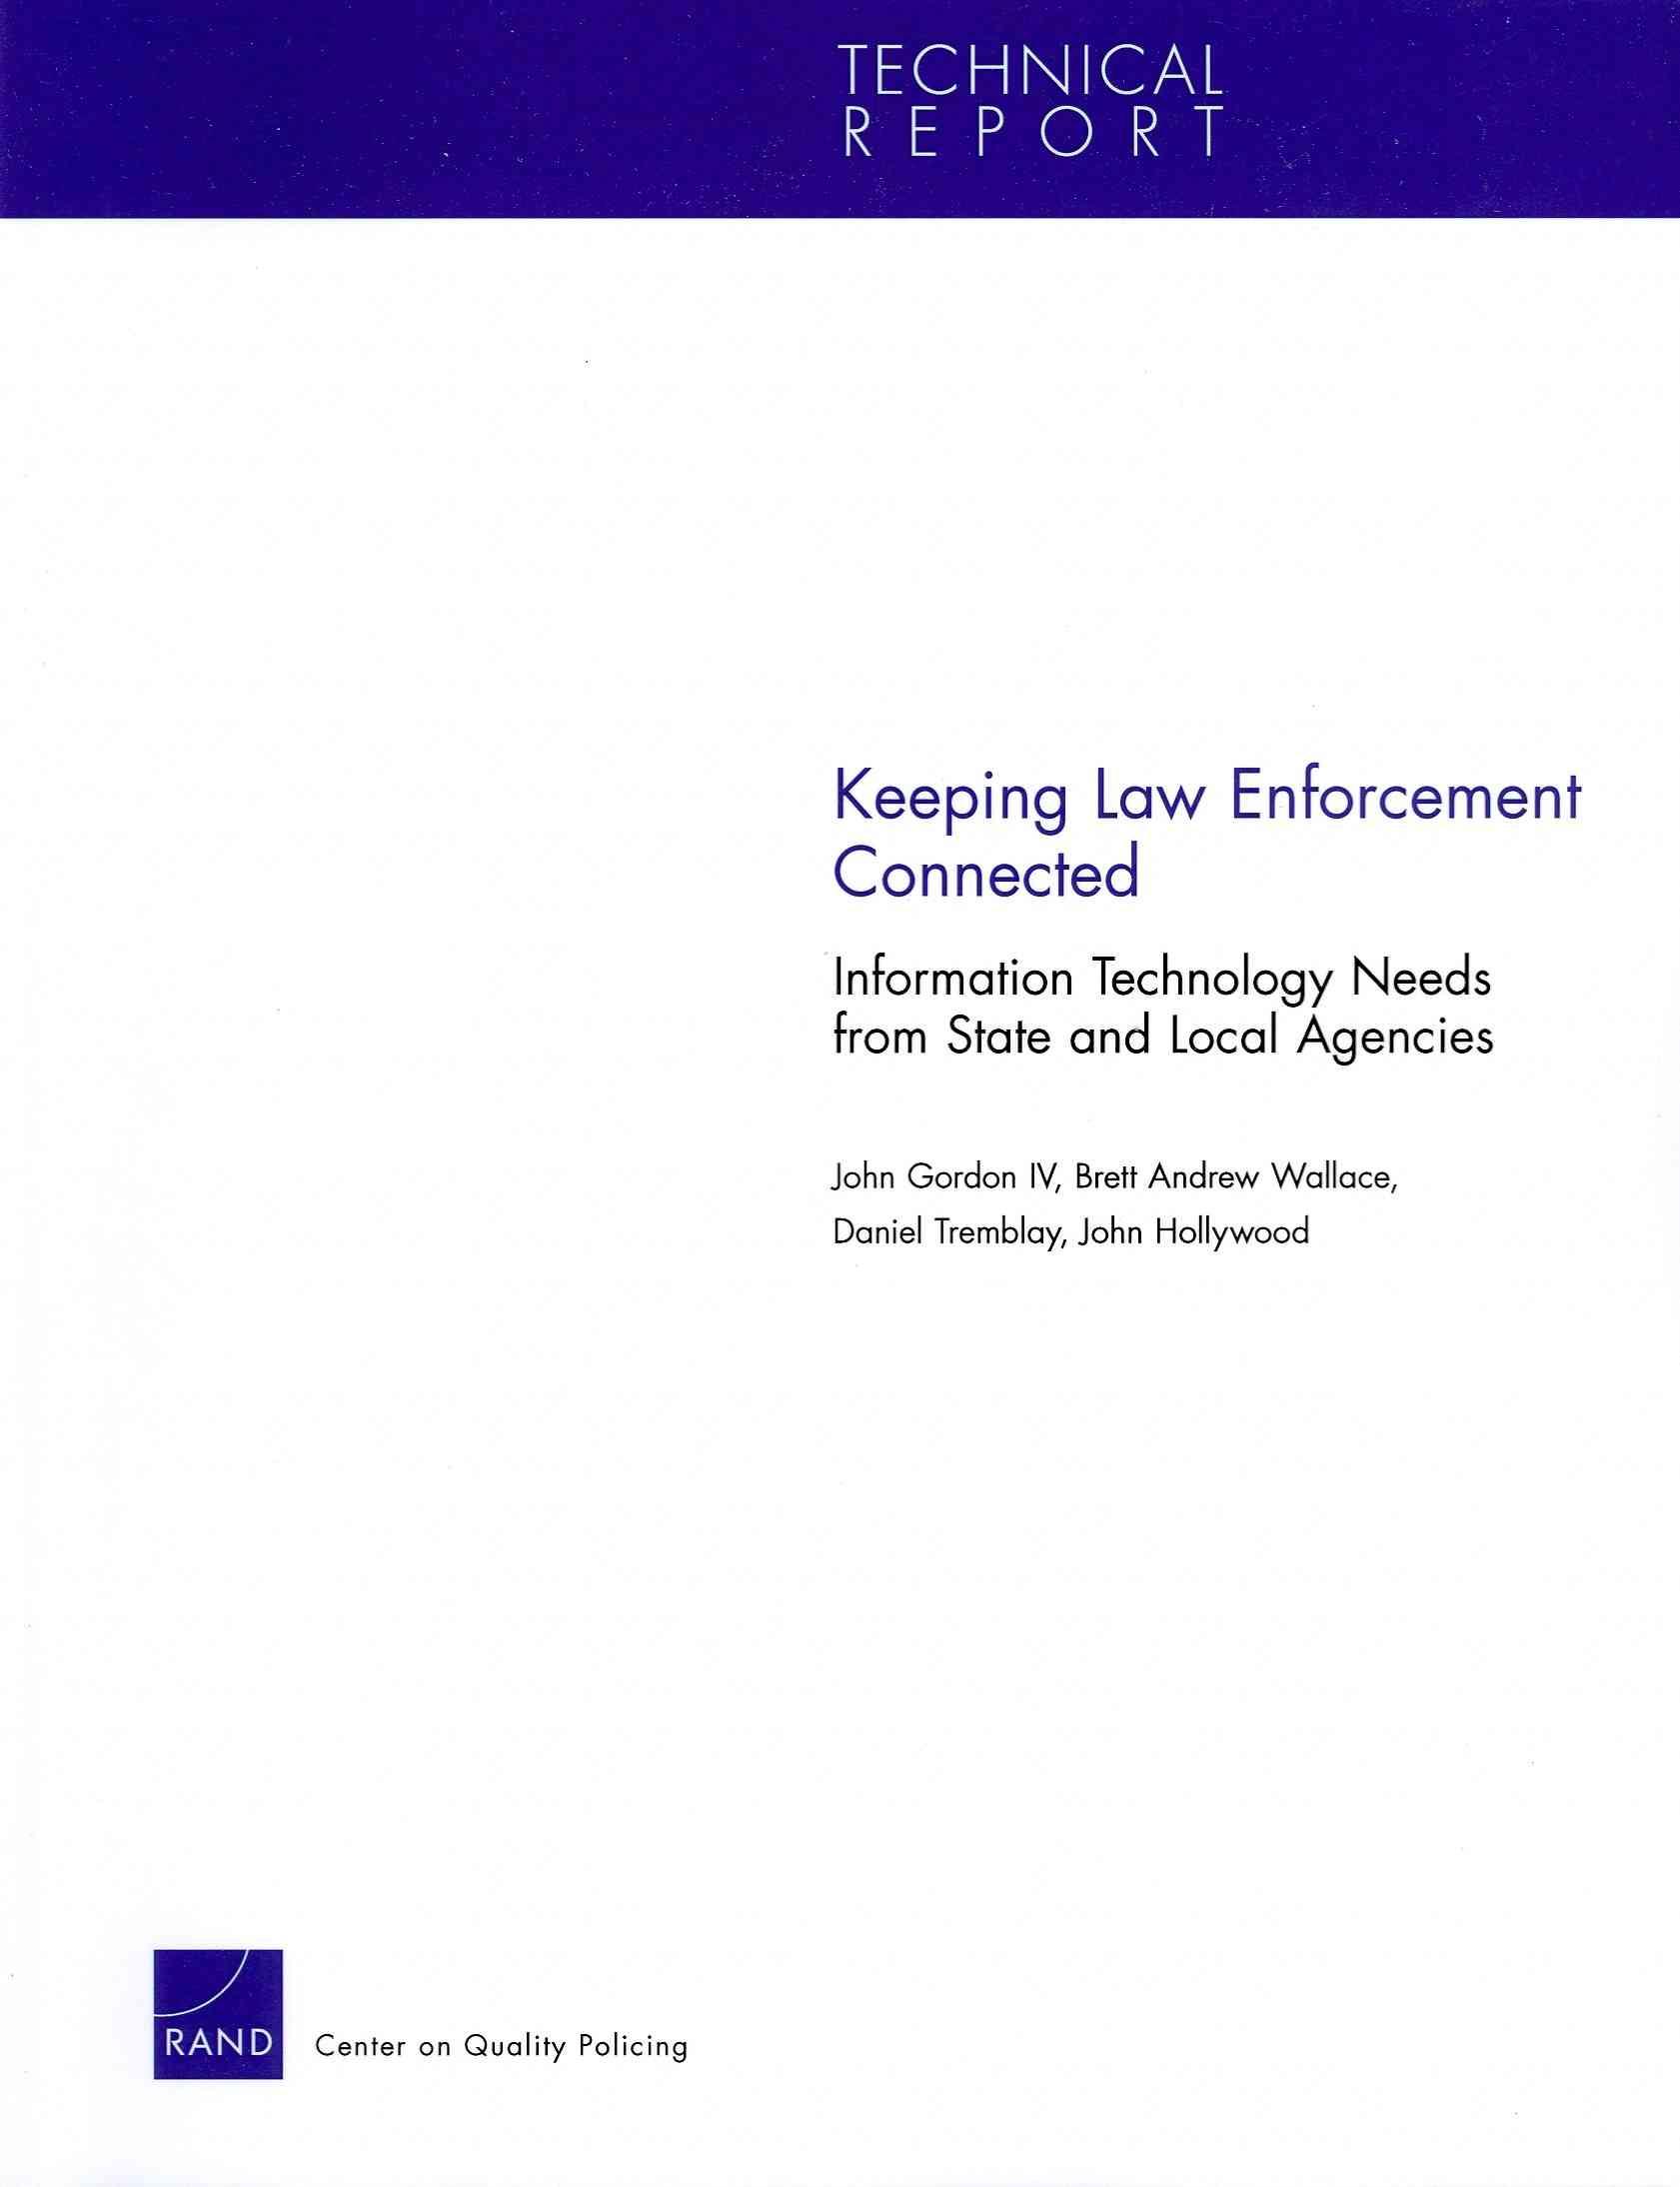 Keeping Law Enforcement Connected By Gordon, John, IV/ Wallace, Brett Andrew/ Tremblay, Daniel/ Hollywood, John